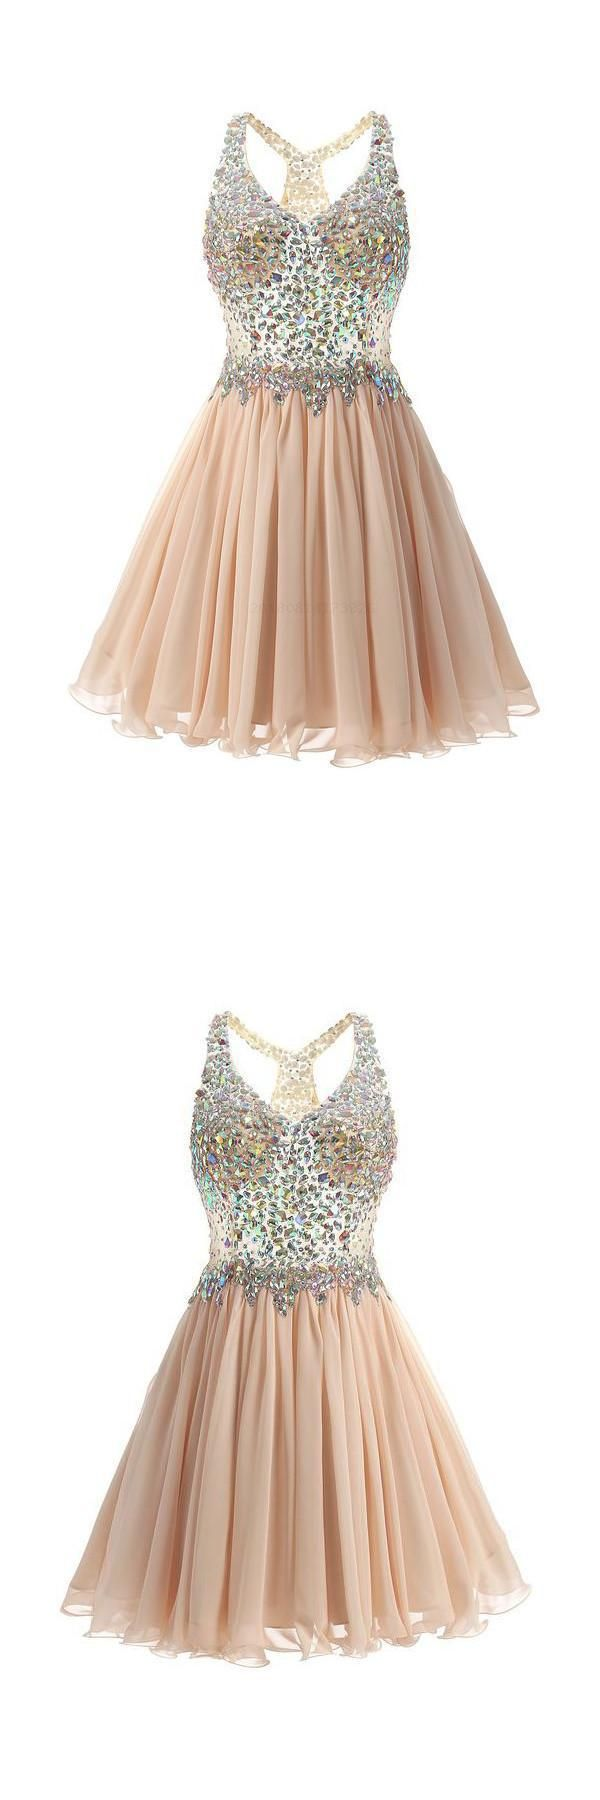 Prom dress short aline prom dress promdressshort alinepromdress